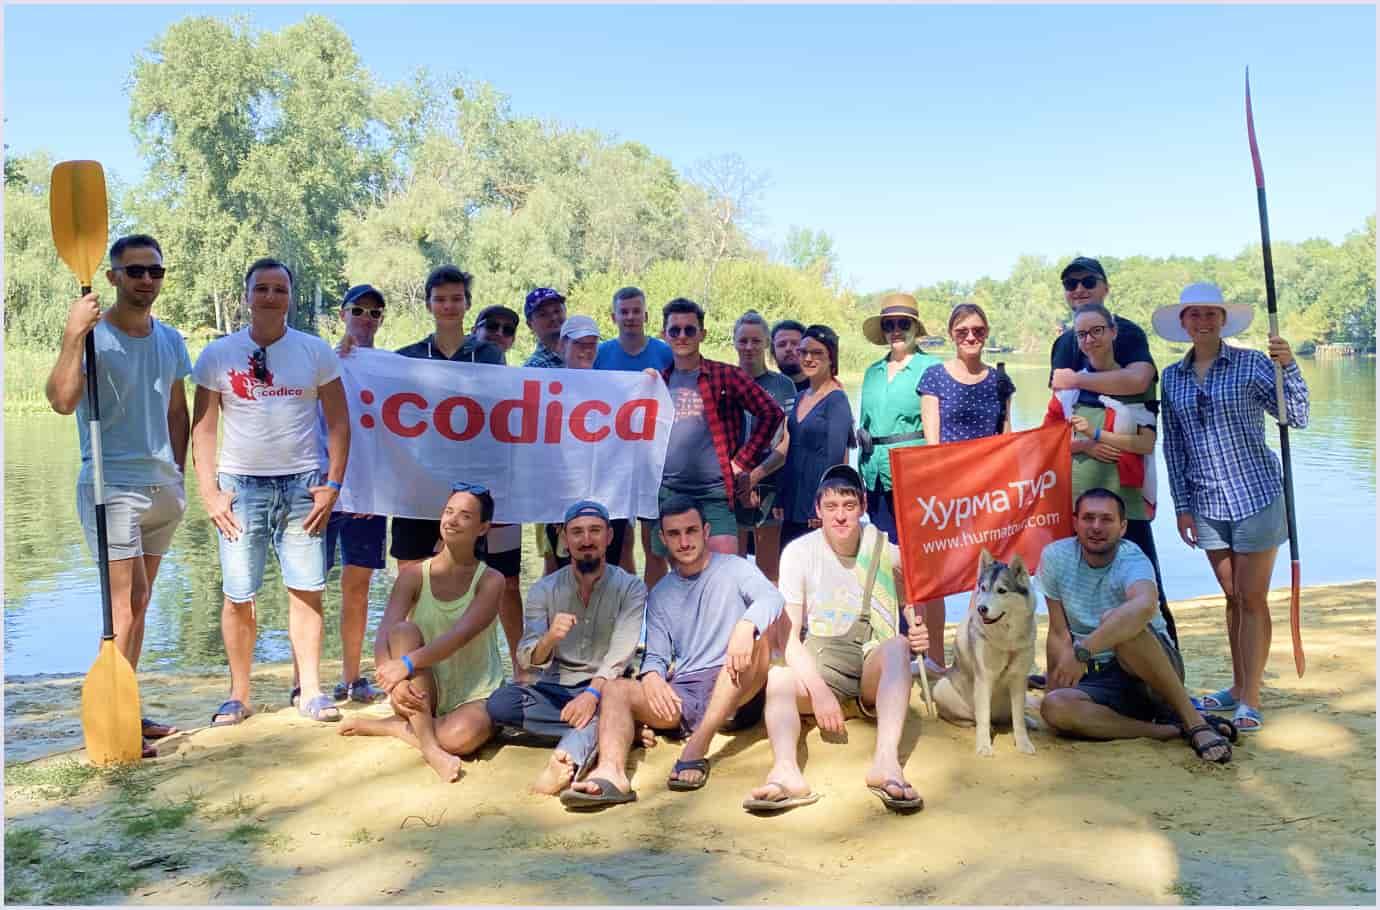 Codica software development team goes kayaking